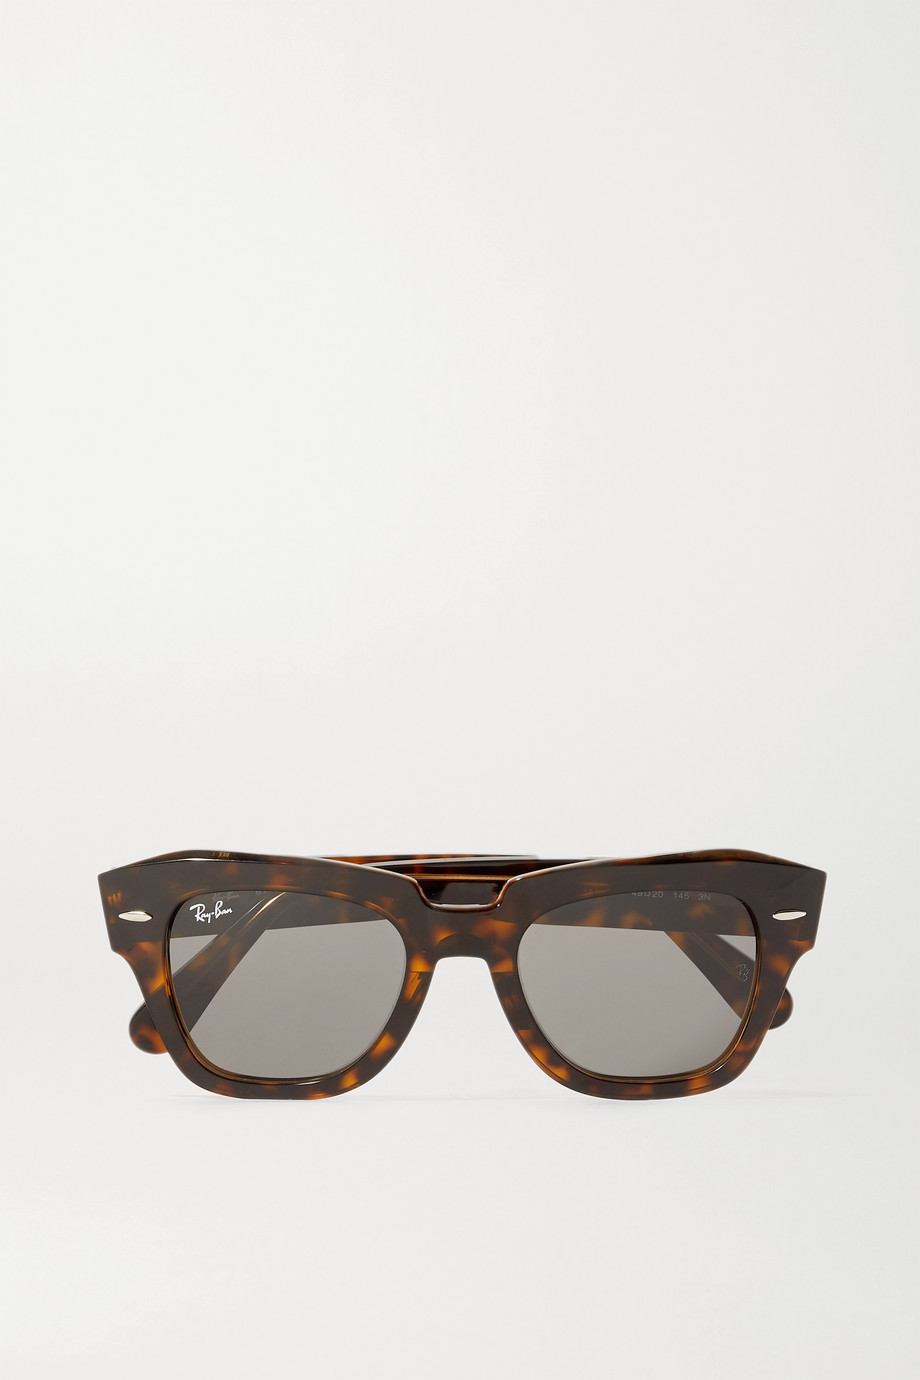 Ray-Ban Wayfarer Sonnenbrille mit eckigem Rahmen aus Azetat in Hornoptik